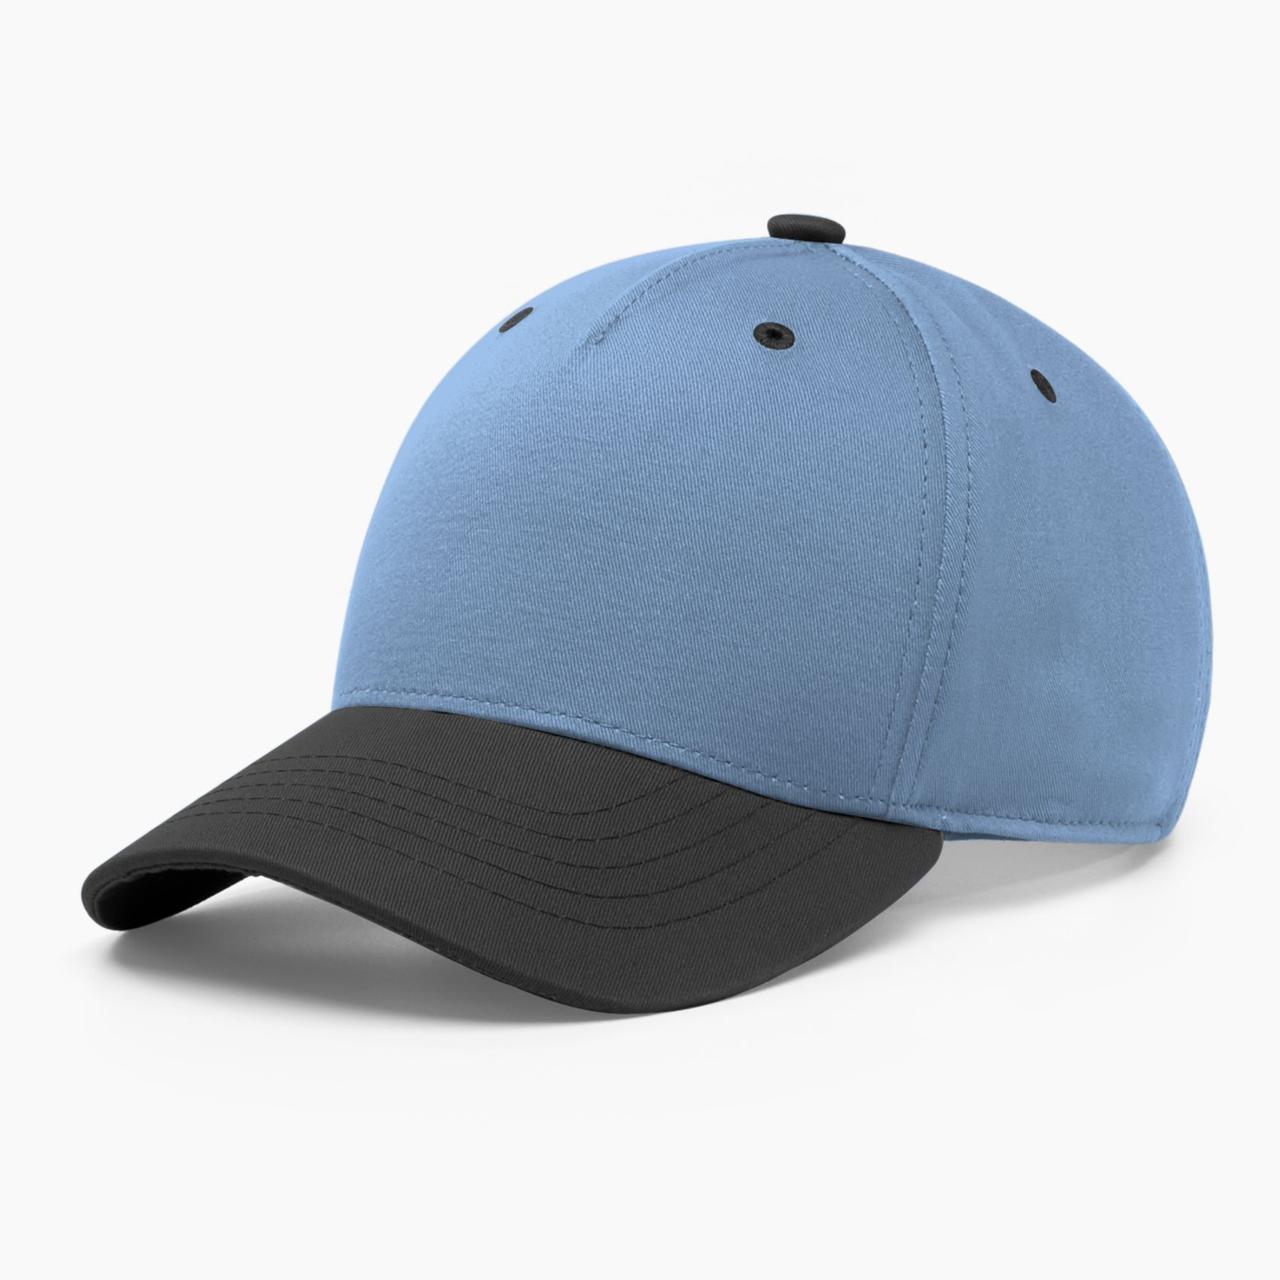 Бейсболка без логотипа INAL basic S / 53-54 RU Синий 287853